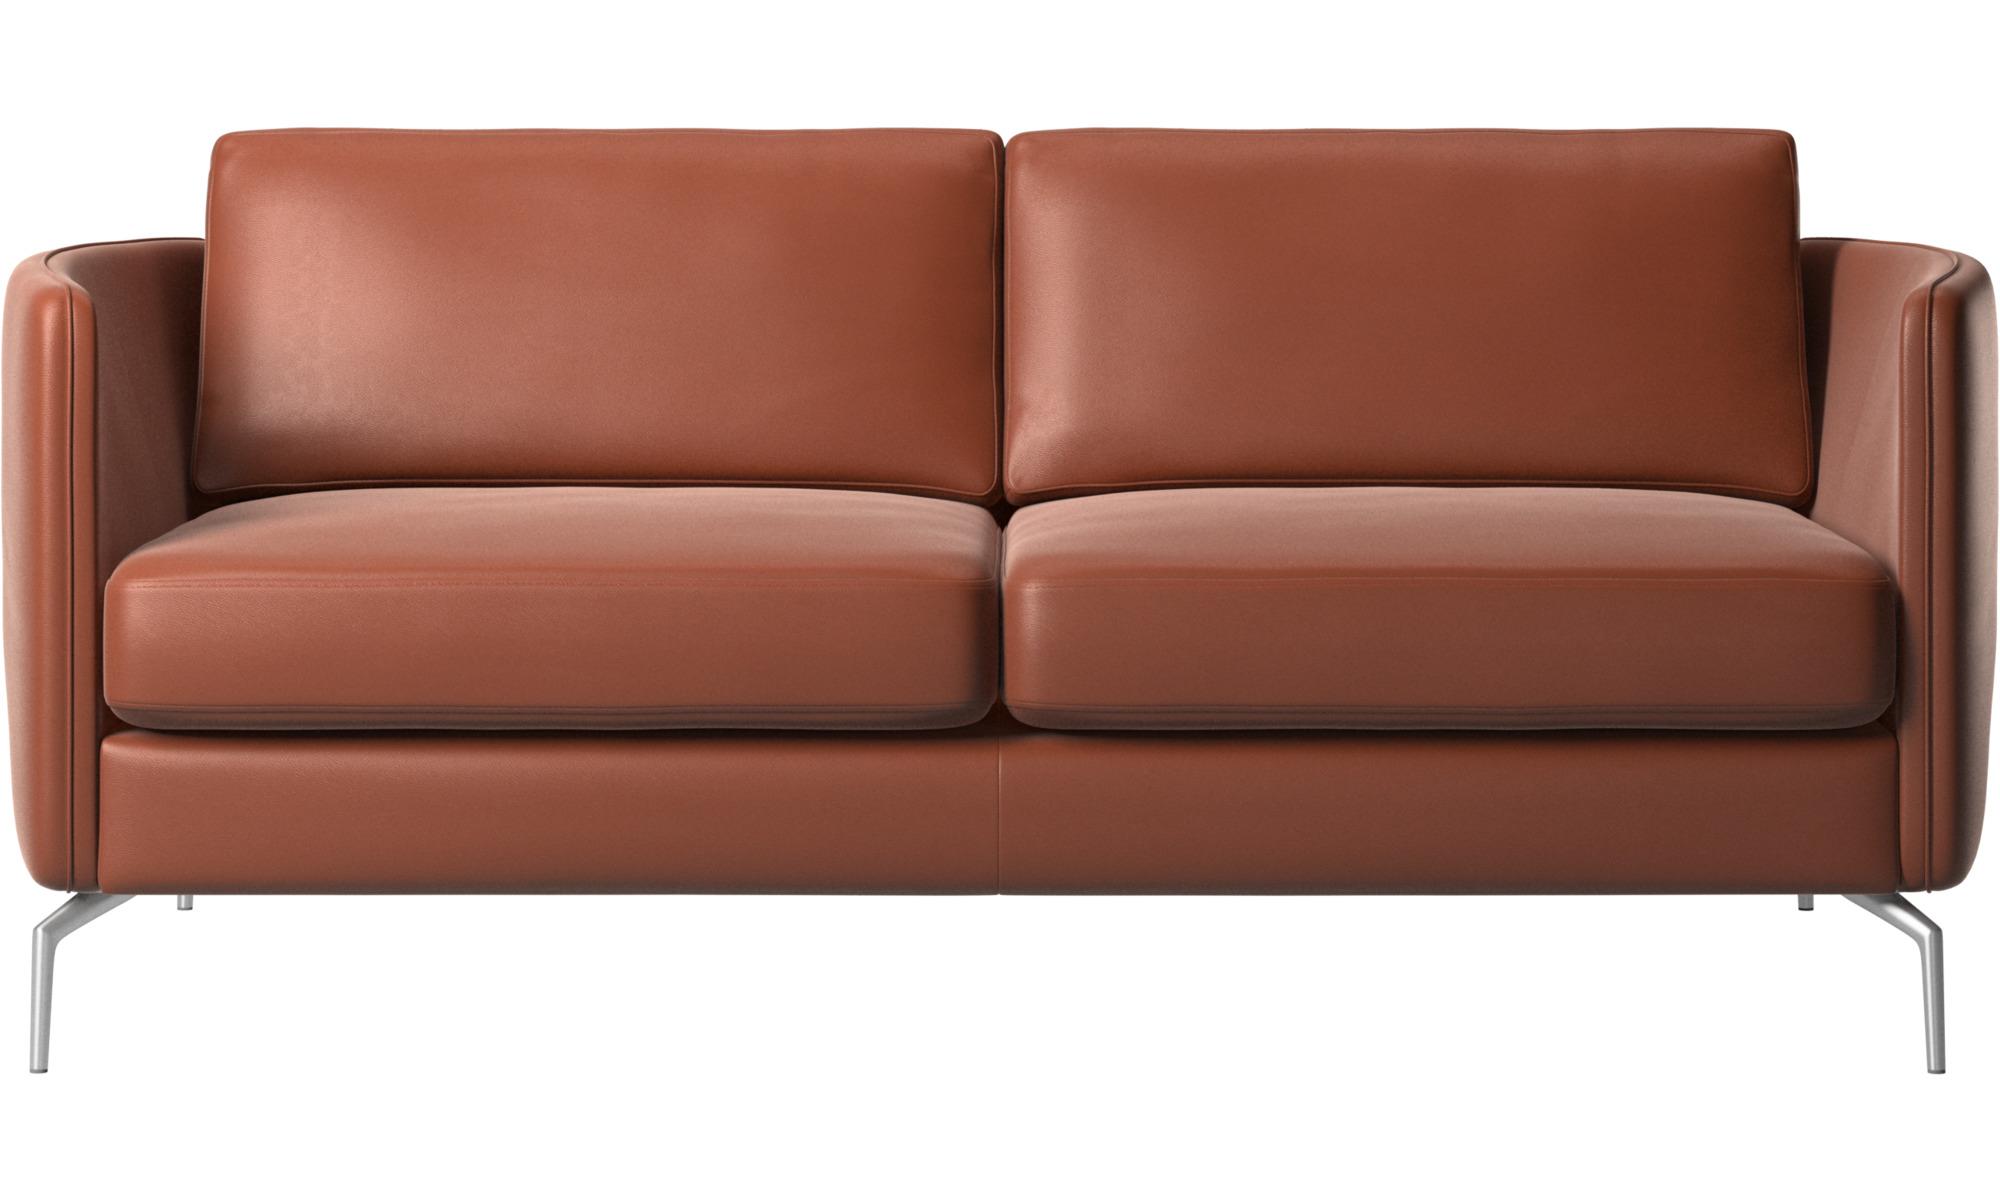 2 seter sofa osaka sofa vanlig sete boconcept. Black Bedroom Furniture Sets. Home Design Ideas